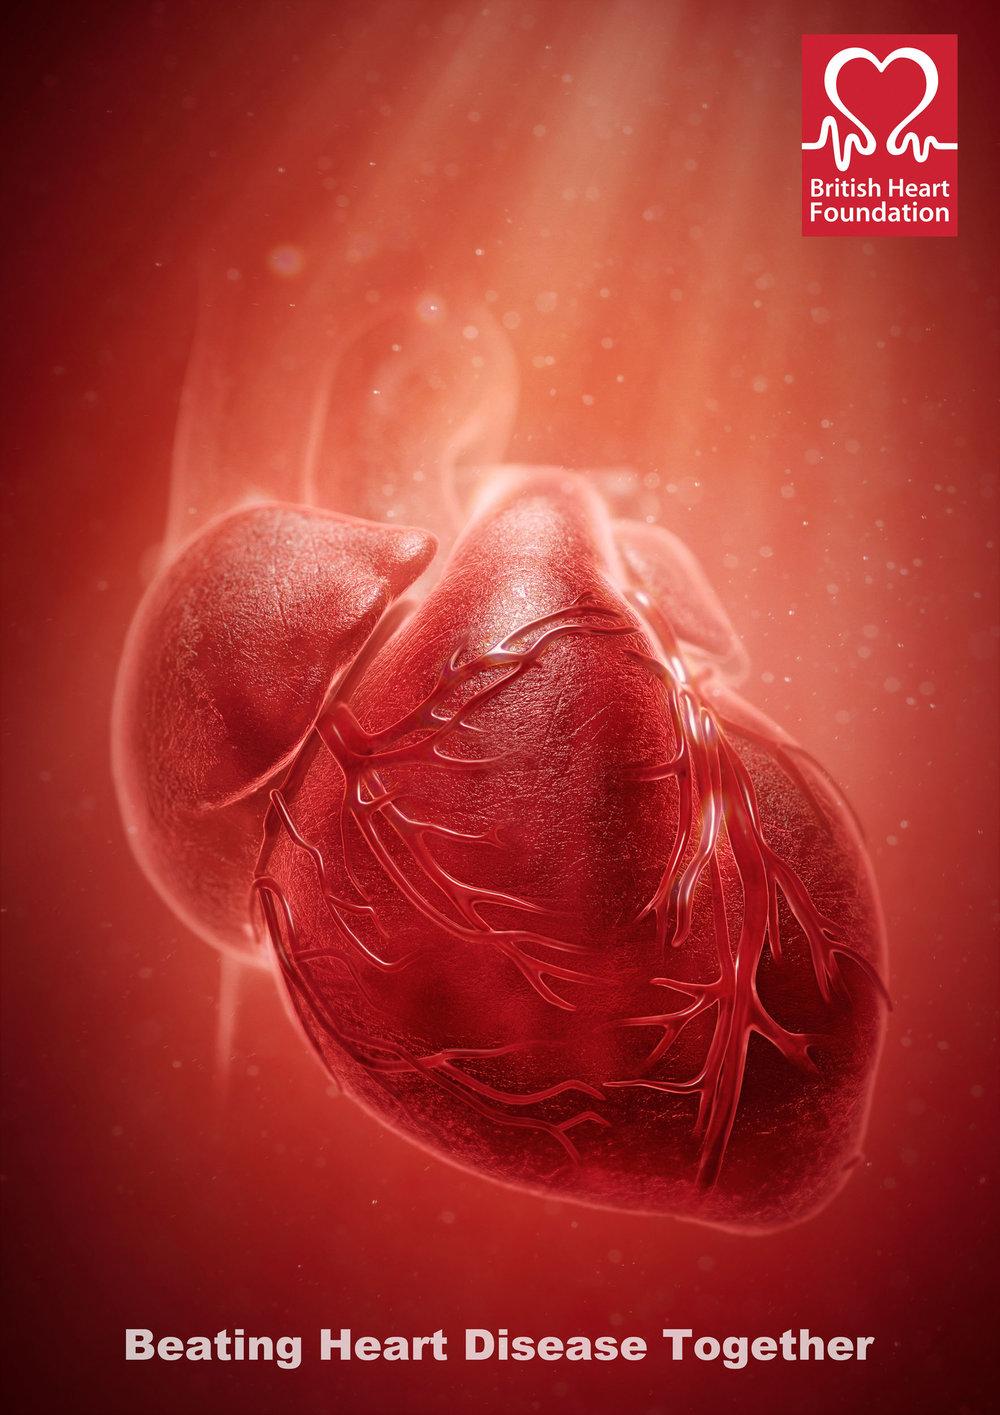 BOOM_CGI_MEDICAL_british-heart-foundation.jpg